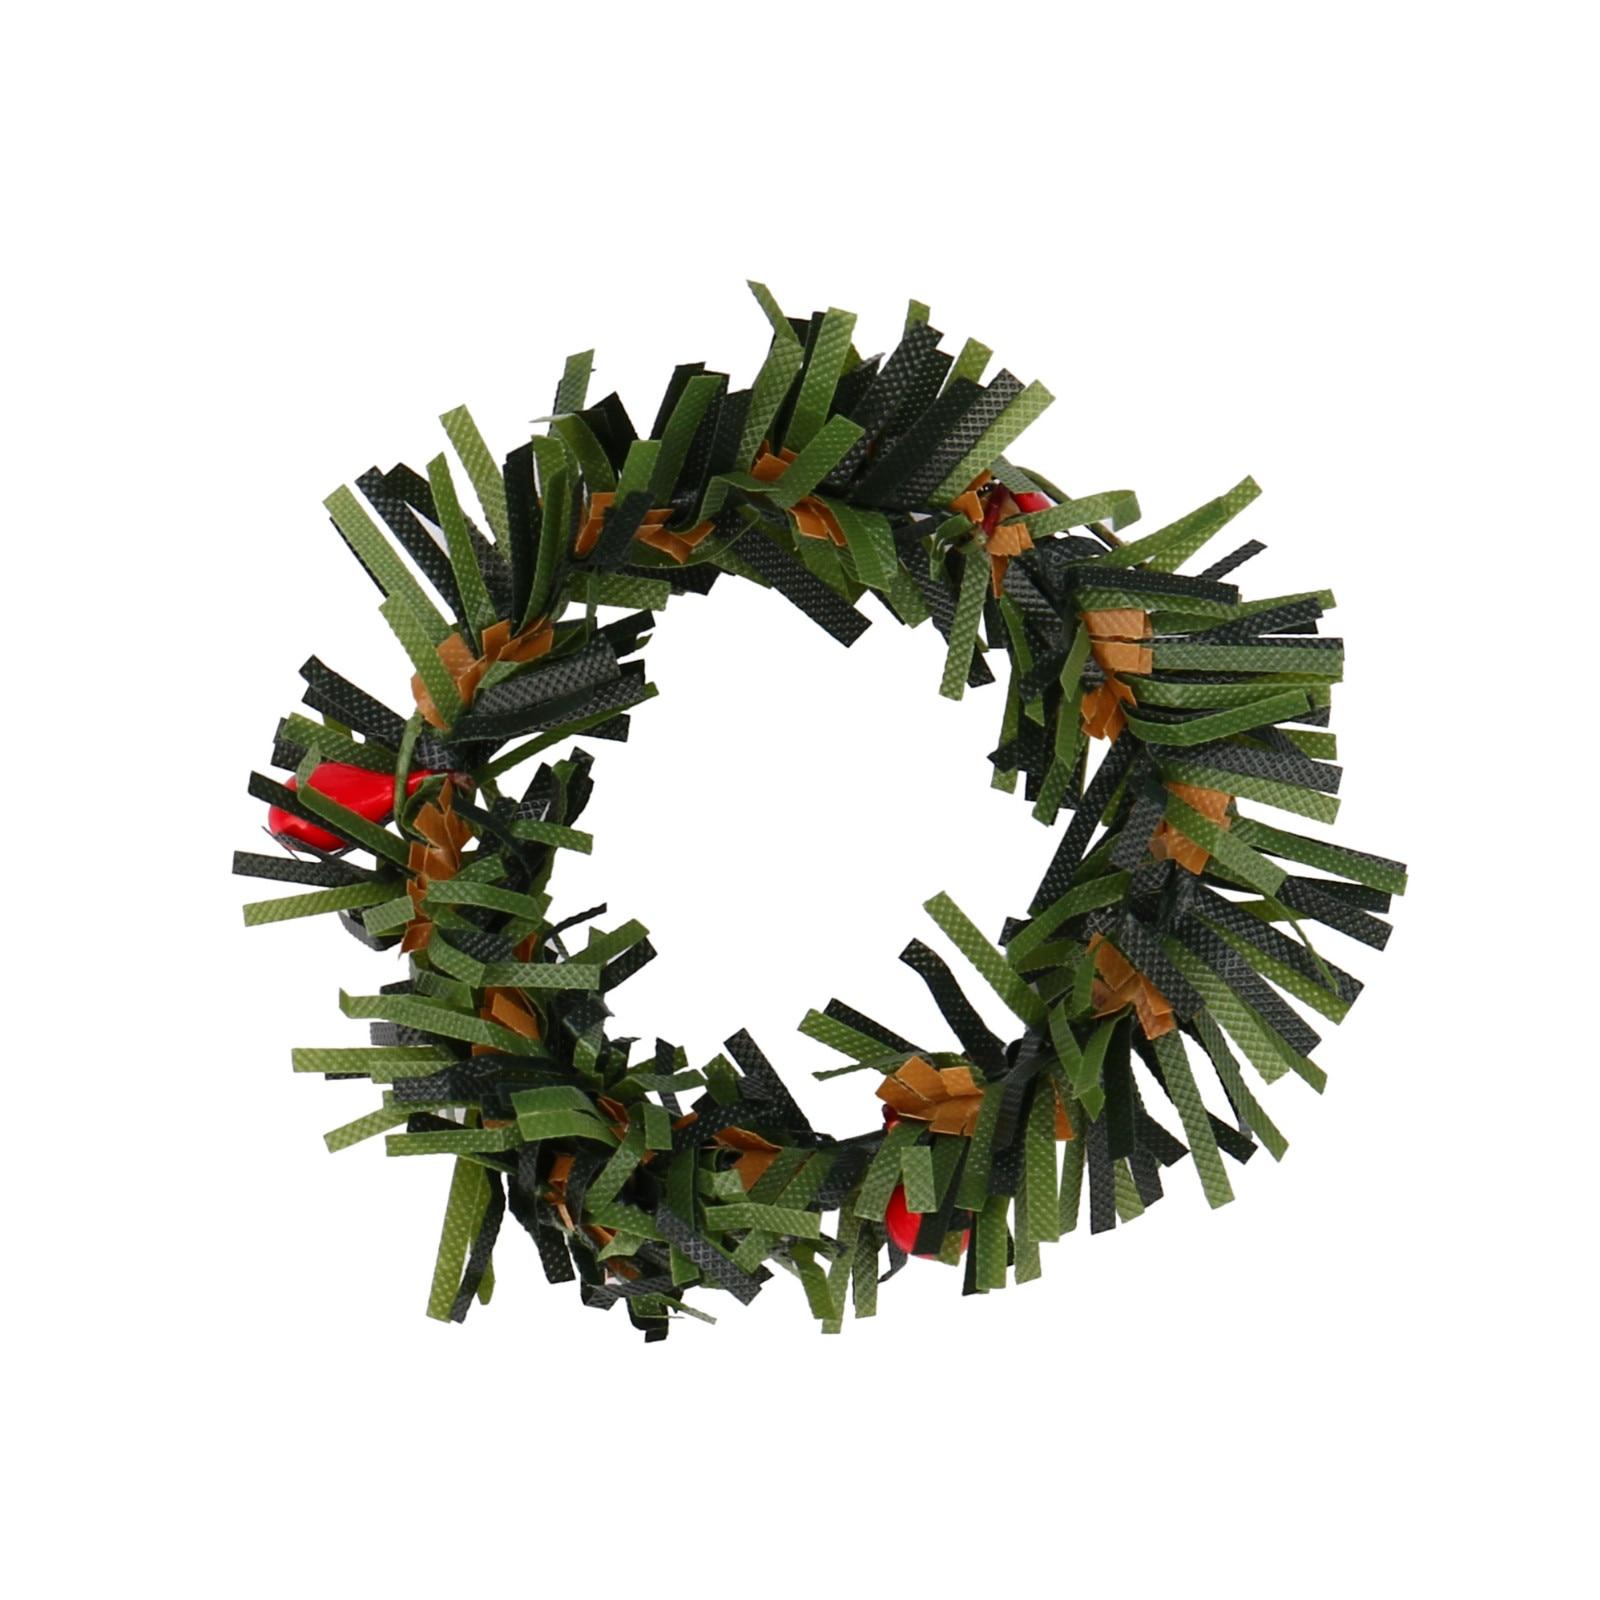 New 10PC Christmas Wreaths Red Ornament Felt Hanging Pendant ...